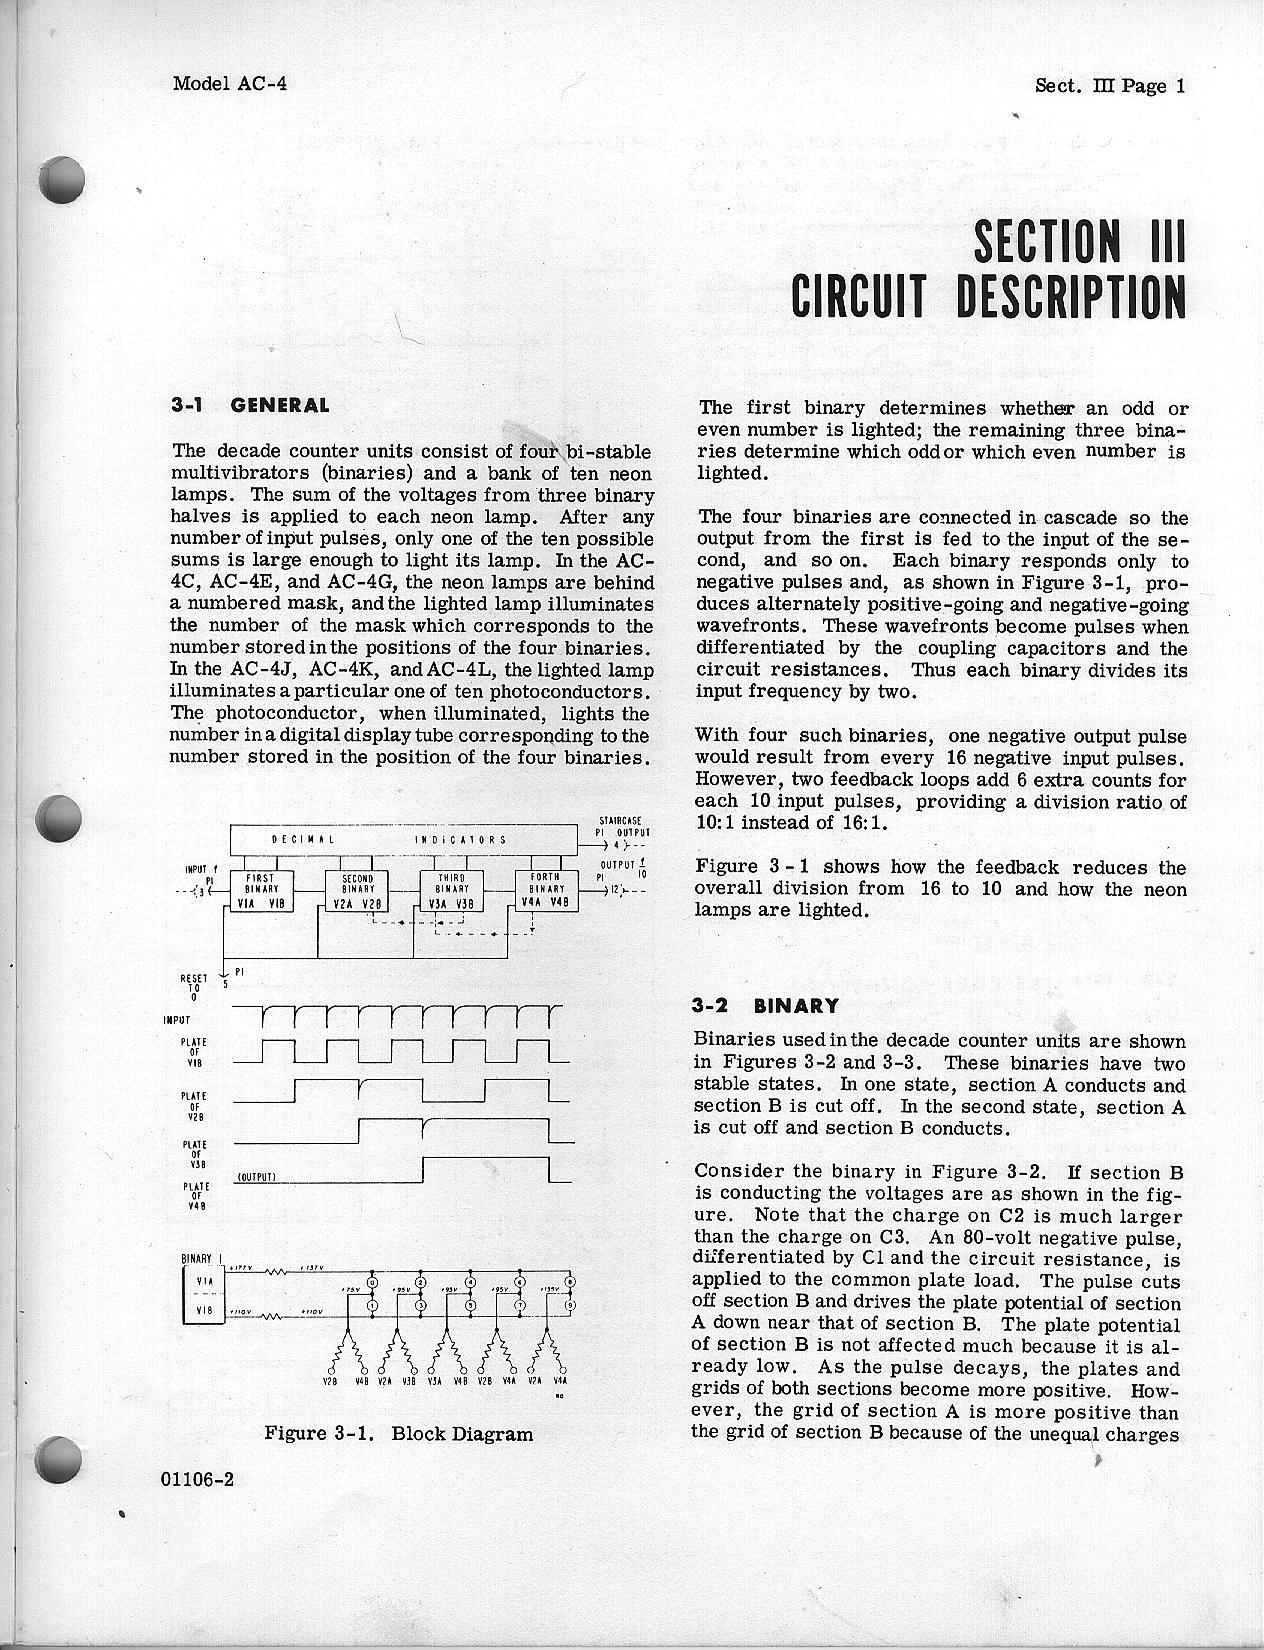 Hewlett Packard Decade Counters Ac 4 Counter Circuit Diagram Description Page 1